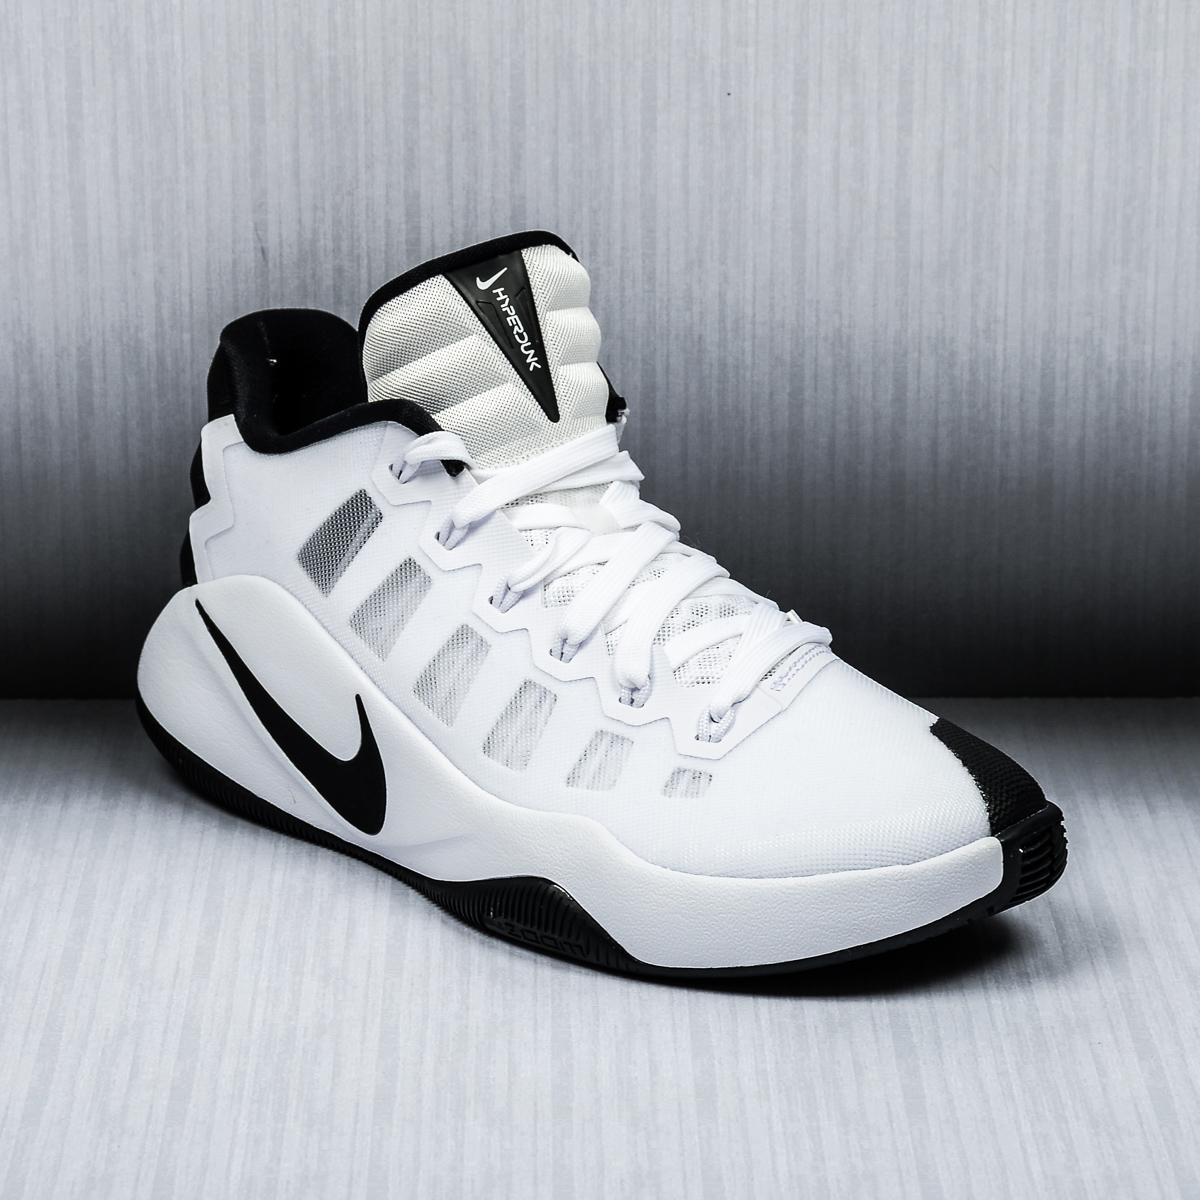 Nike Hyperdunk 2016 Low Basketball Shoes - BASKETBALL ...